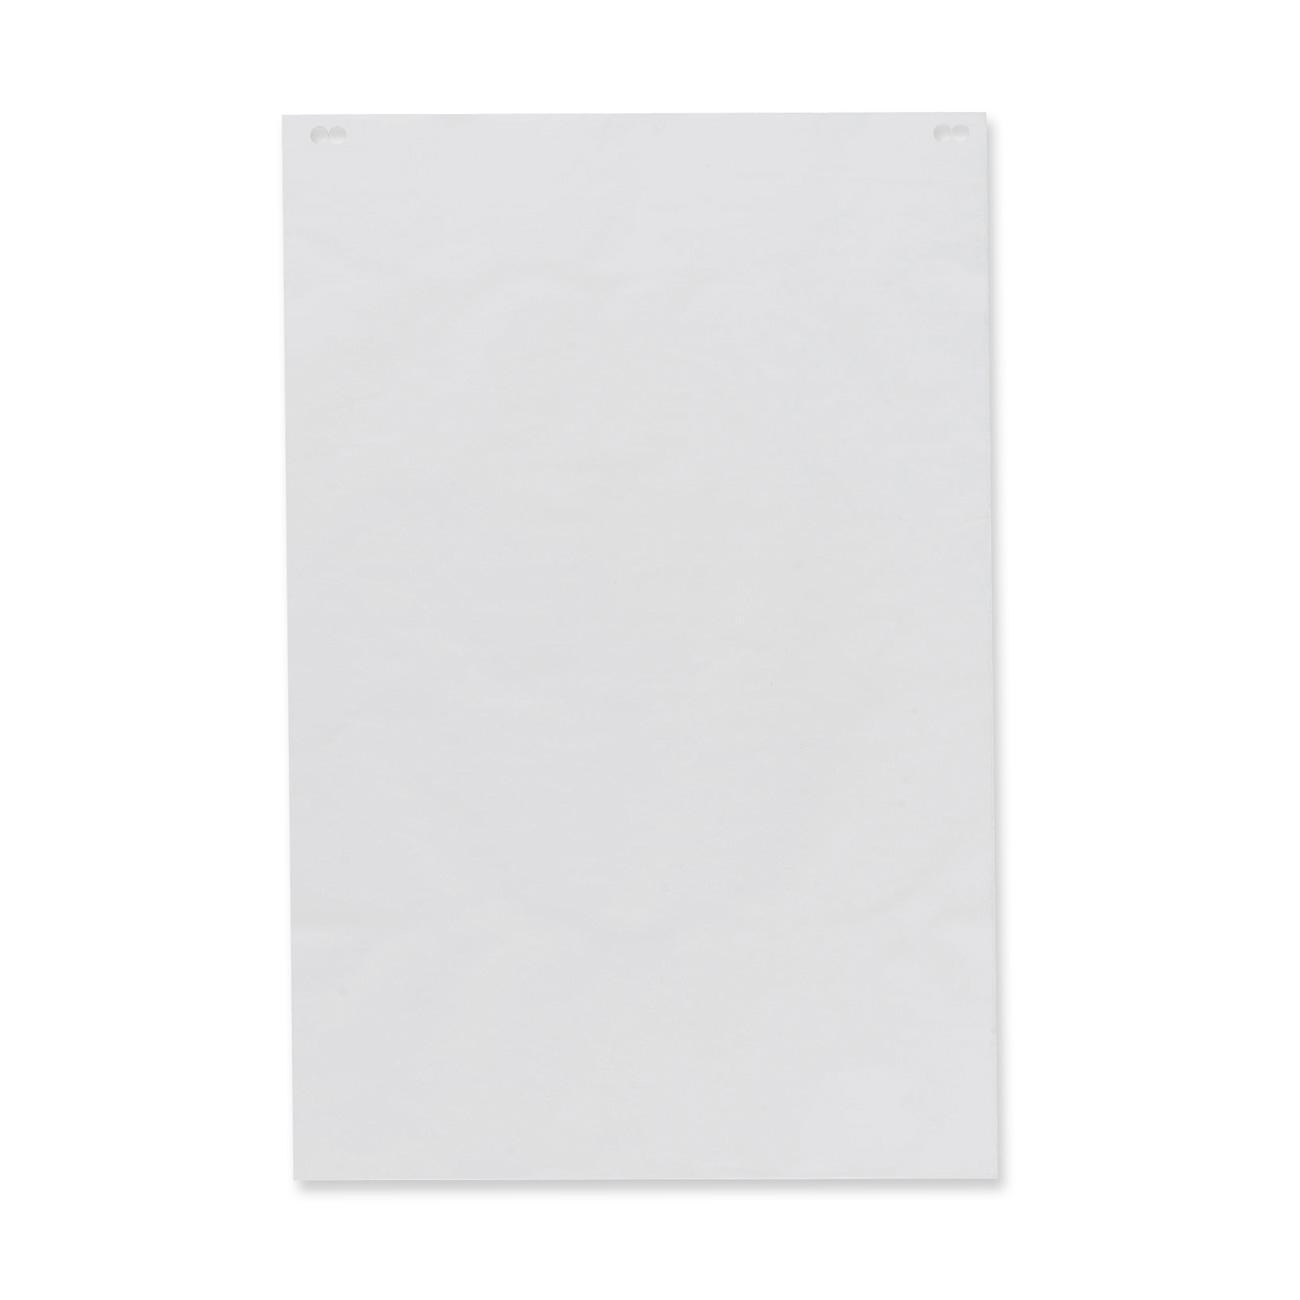 "Quartet Newsprint Flip Chart Easel Pad 24"" x 36"" White - 50 Sheets"